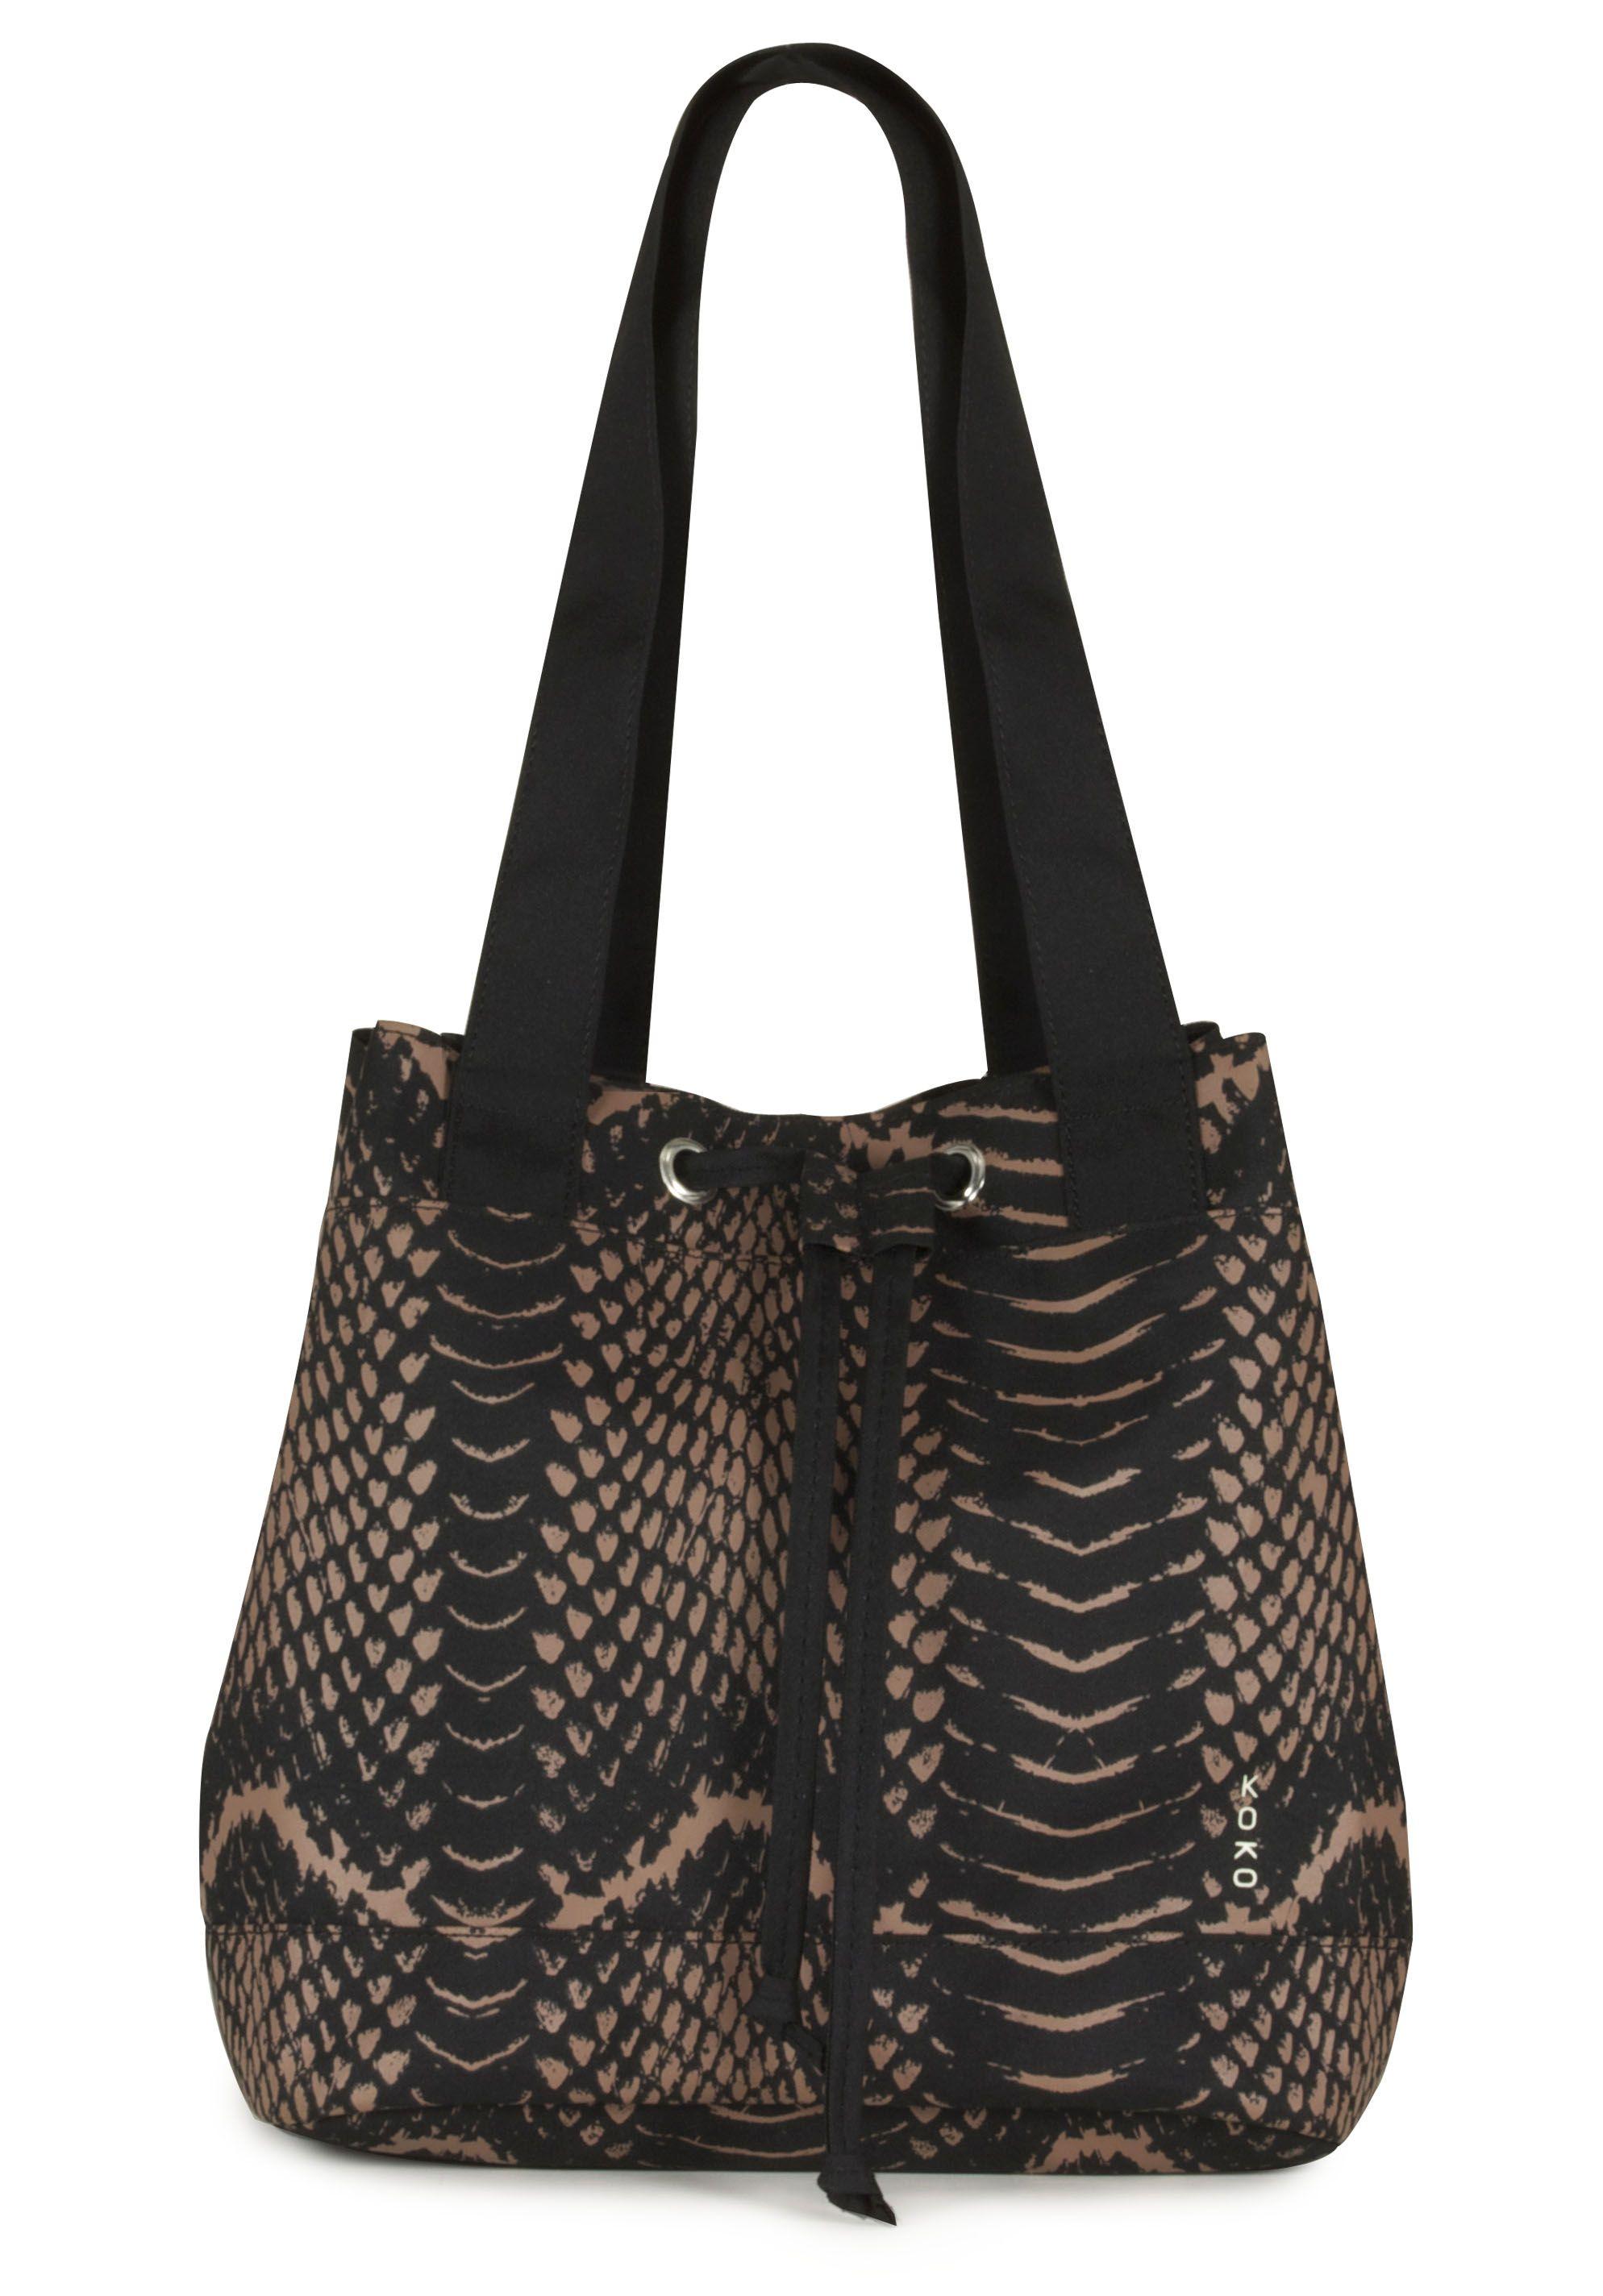 Miwa Snakeskin Insulated Lunch Bag By Koko